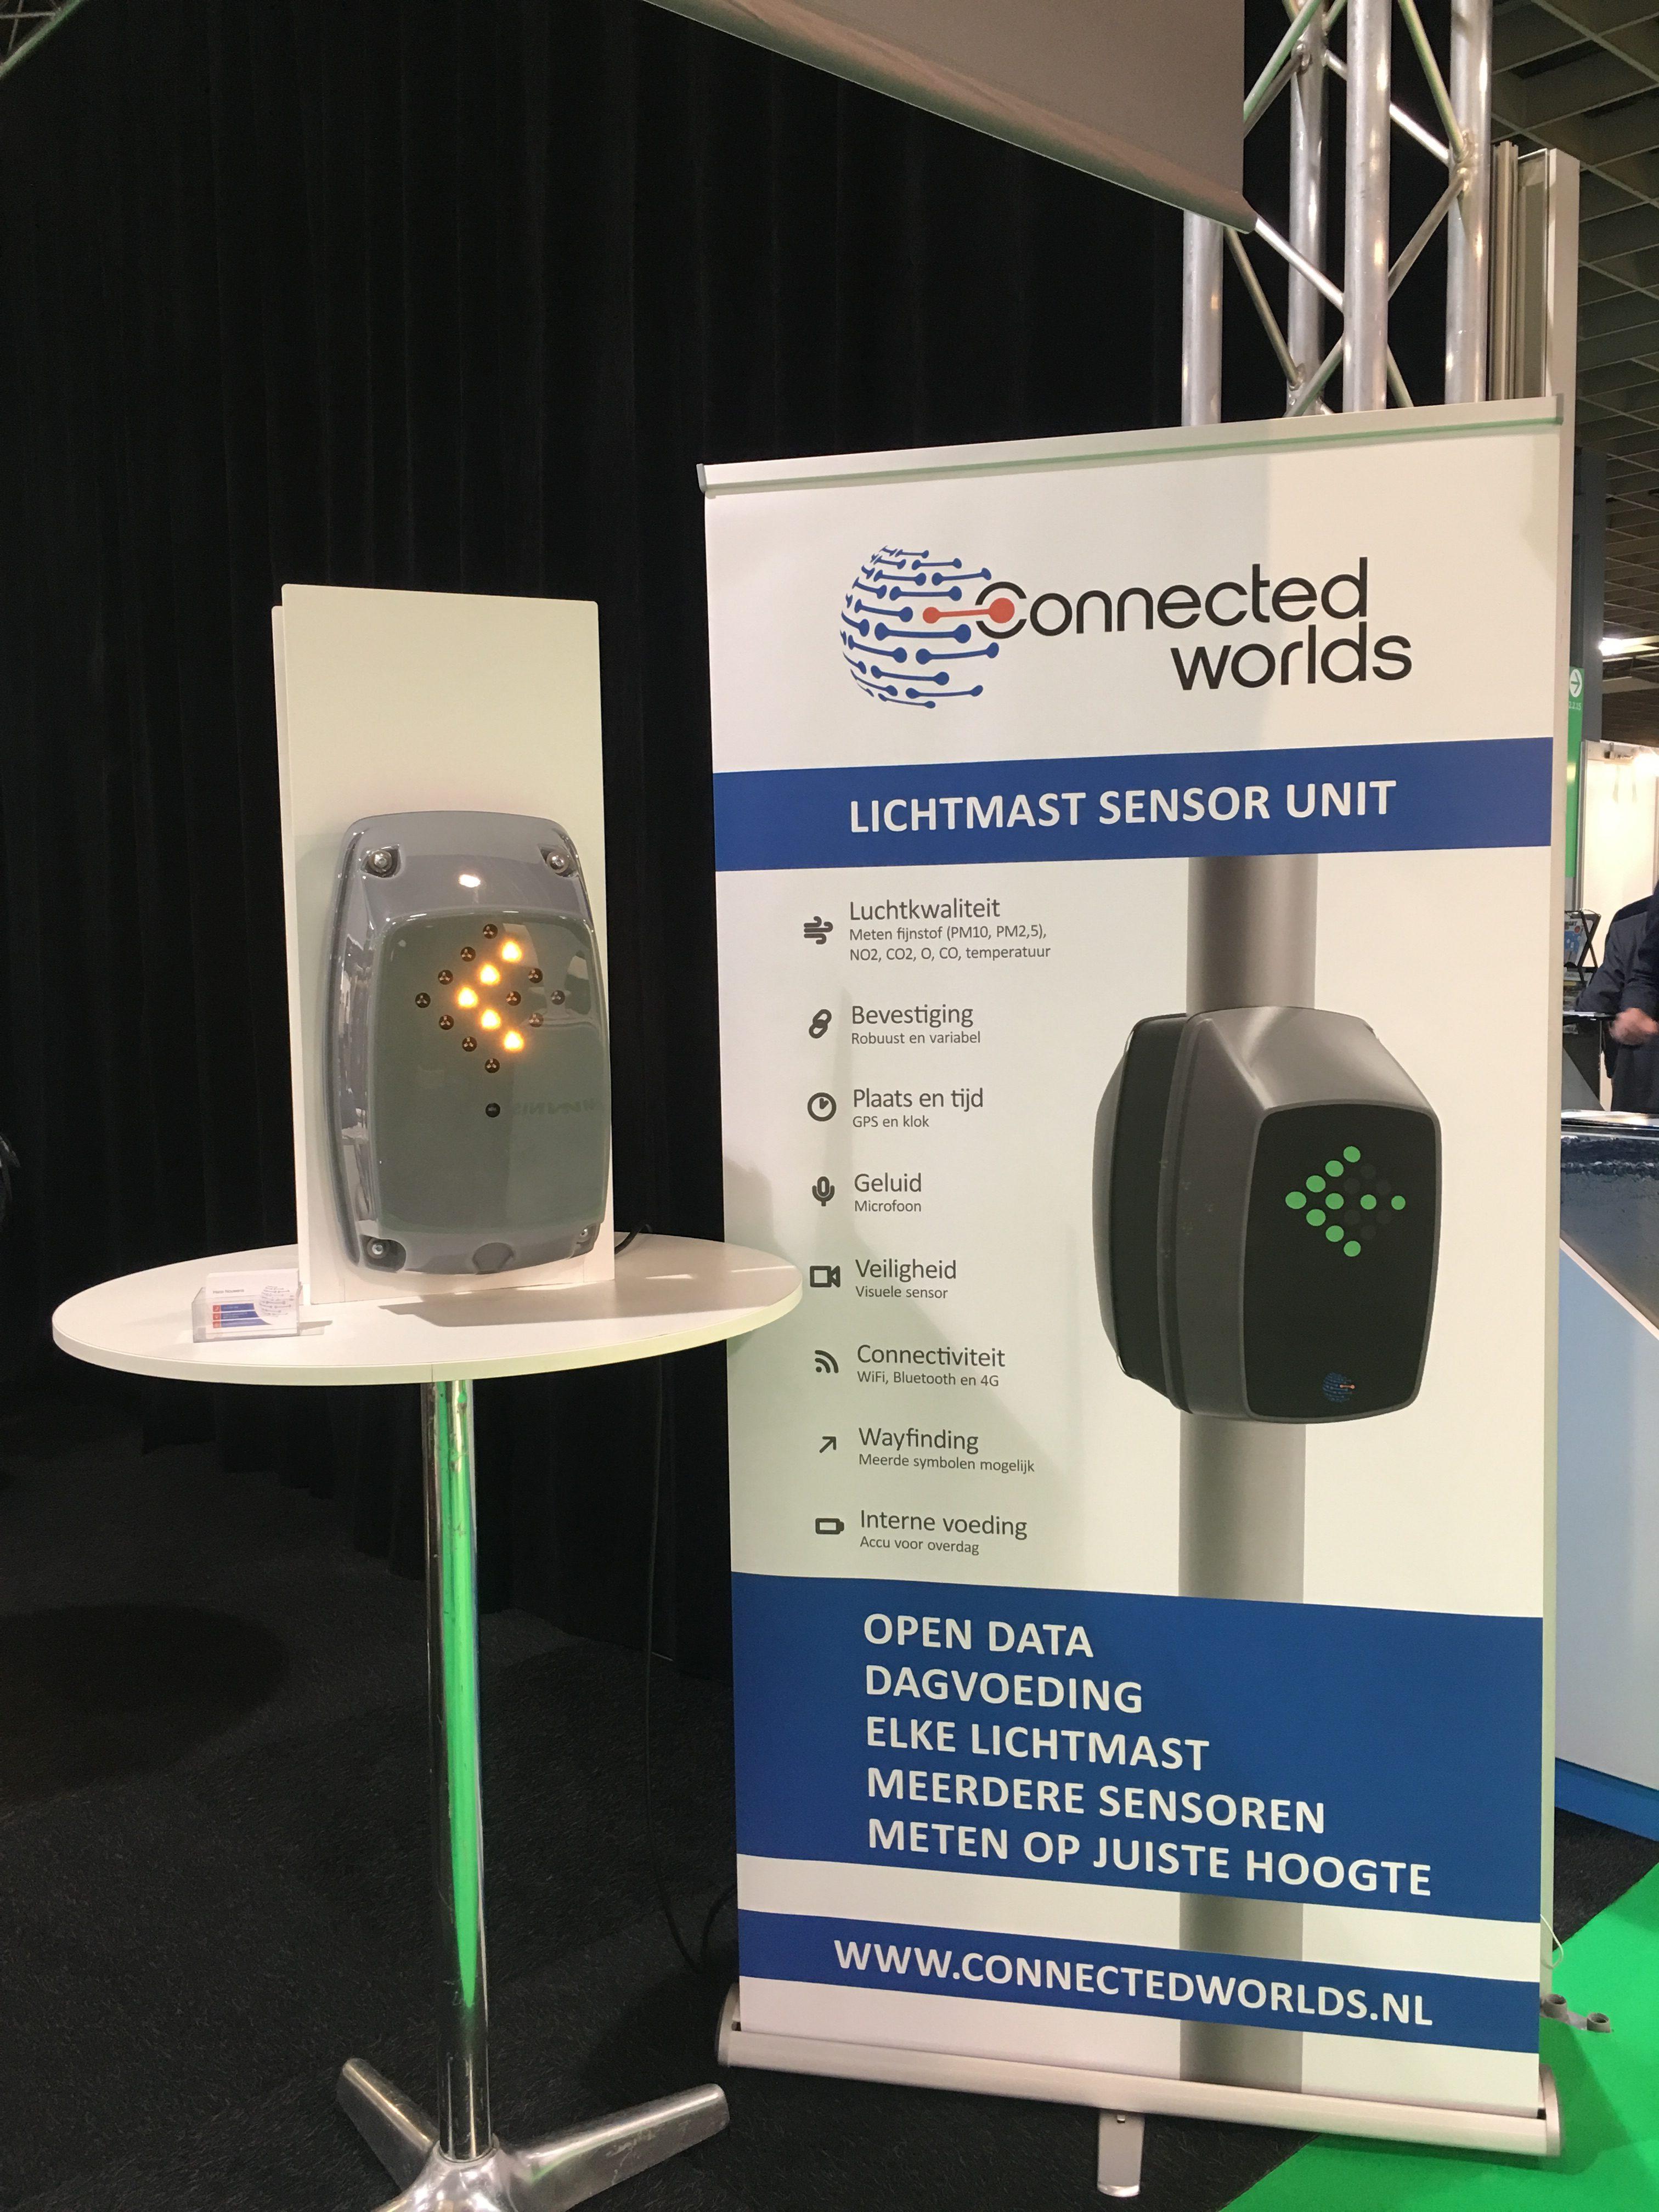 Lancering Lichtmast Sensor Unit